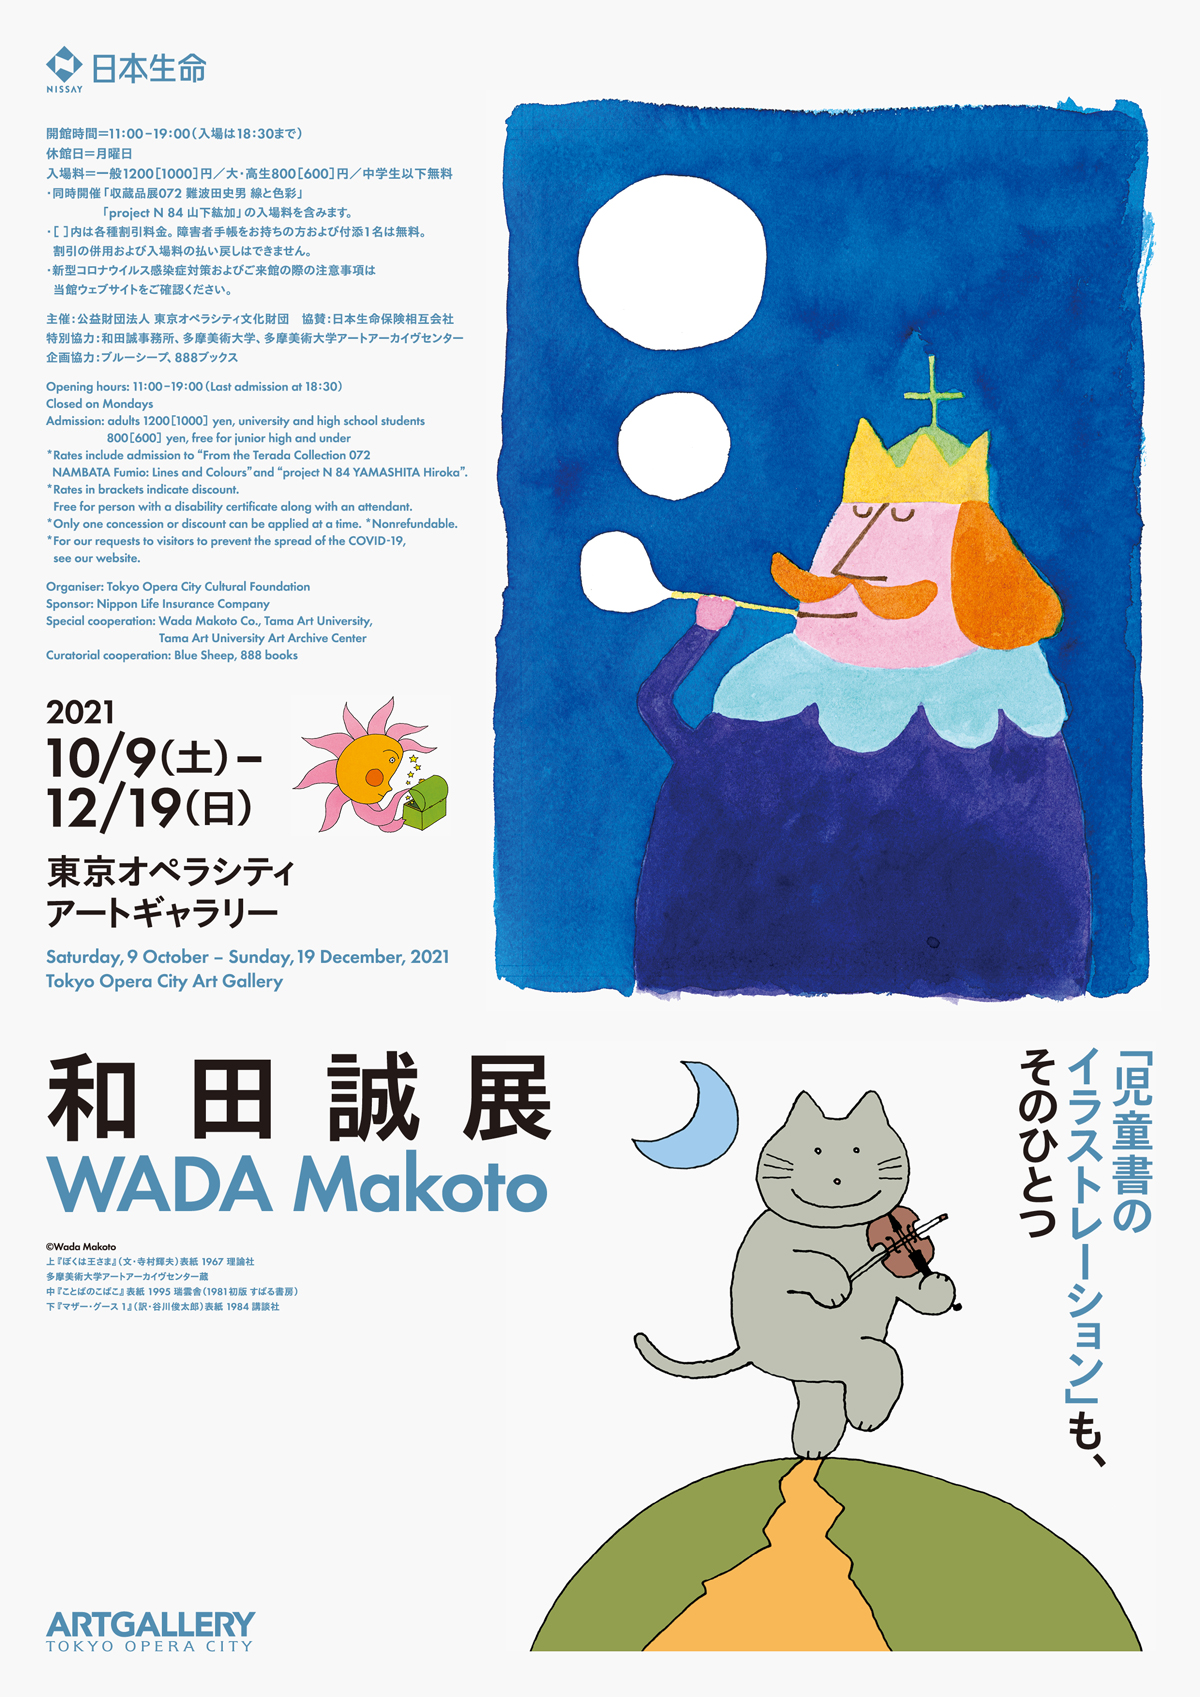 wada_a4_flyer6